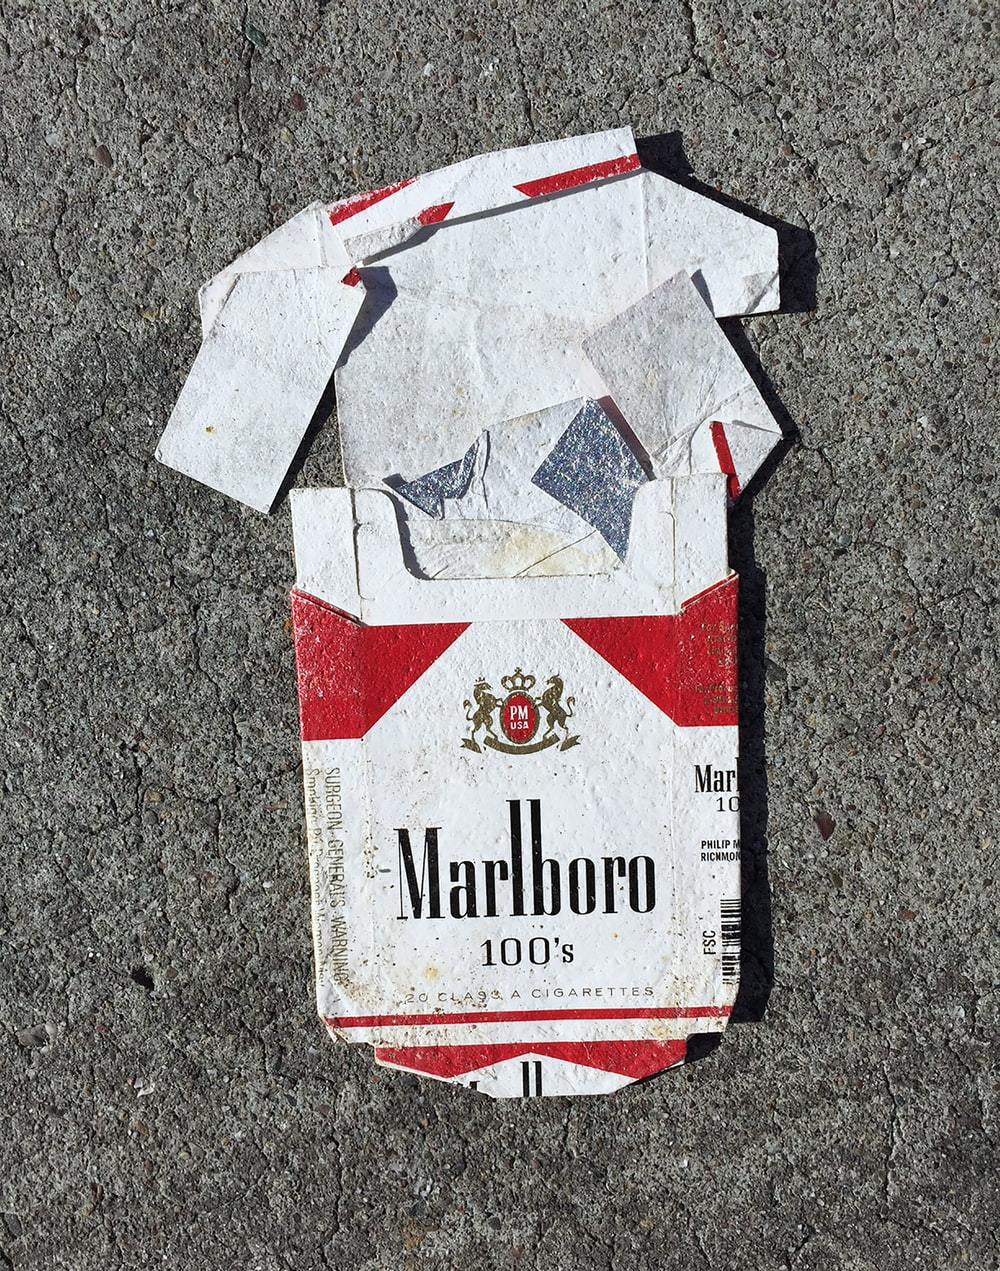 red Marlboro cigarette box on gray surface